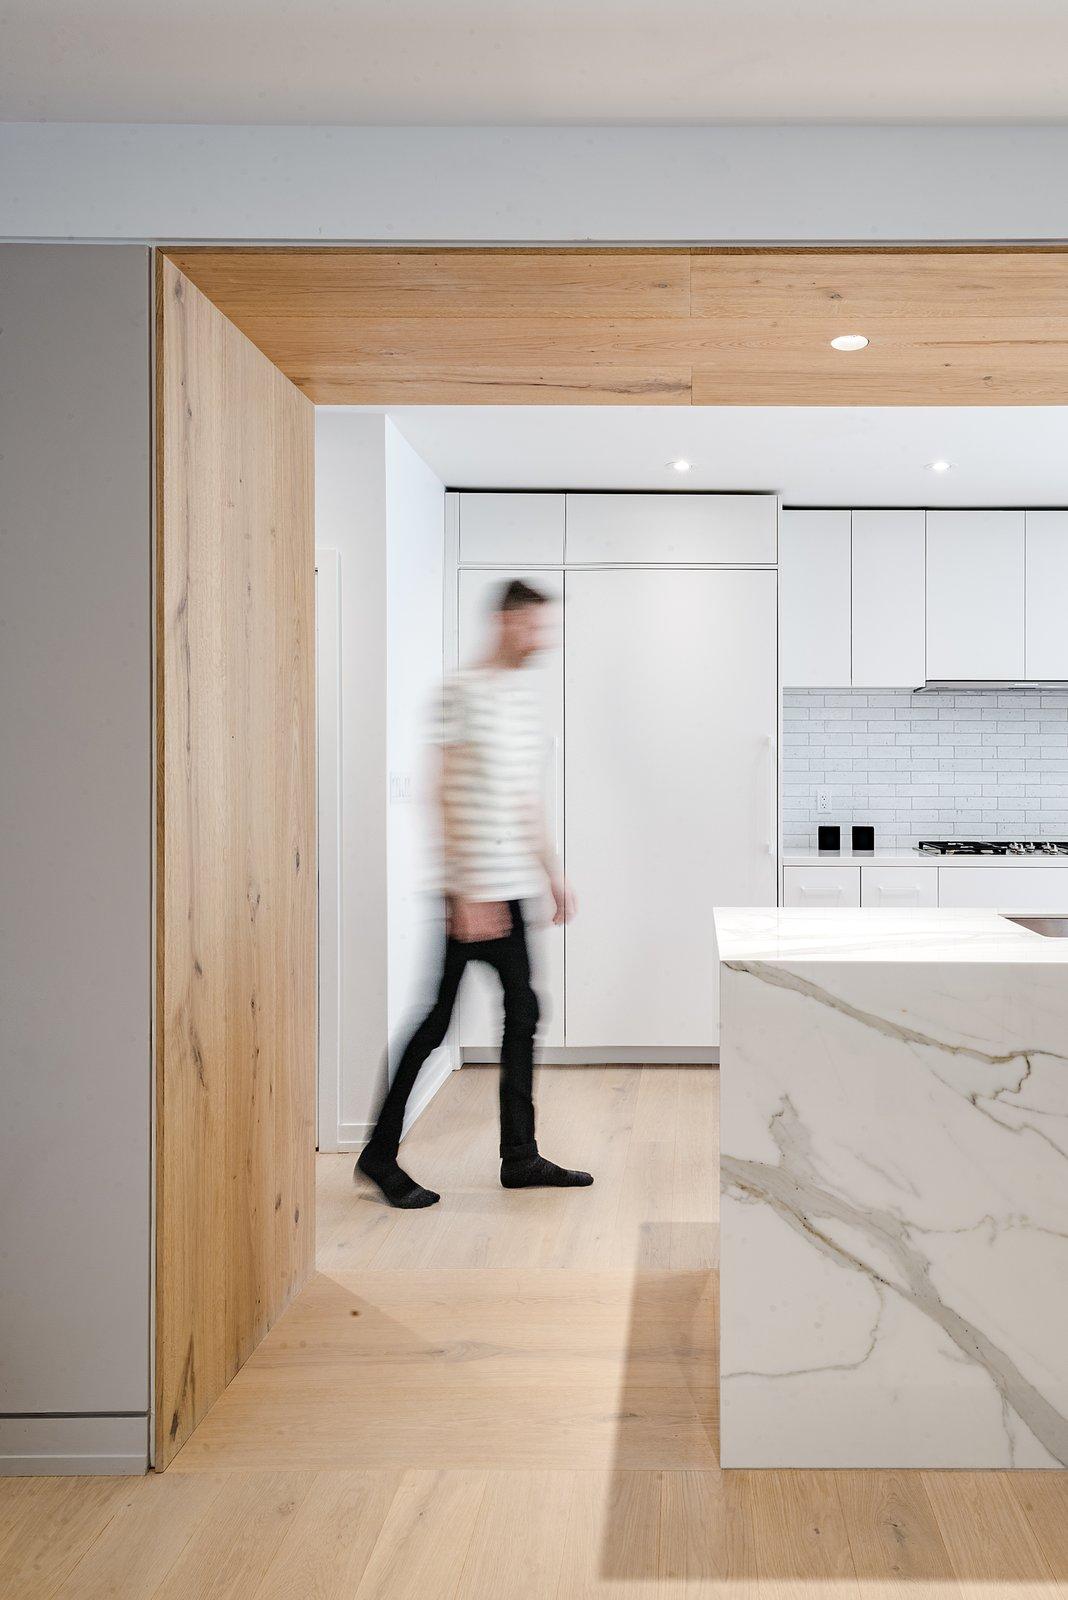 Kitchen, Quartzite Counter, White Cabinet, Subway Tile Backsplashe, Ceiling Lighting, Recessed Lighting, Light Hardwood Floor, Refrigerator, and Undermount Sink  Richview Residence